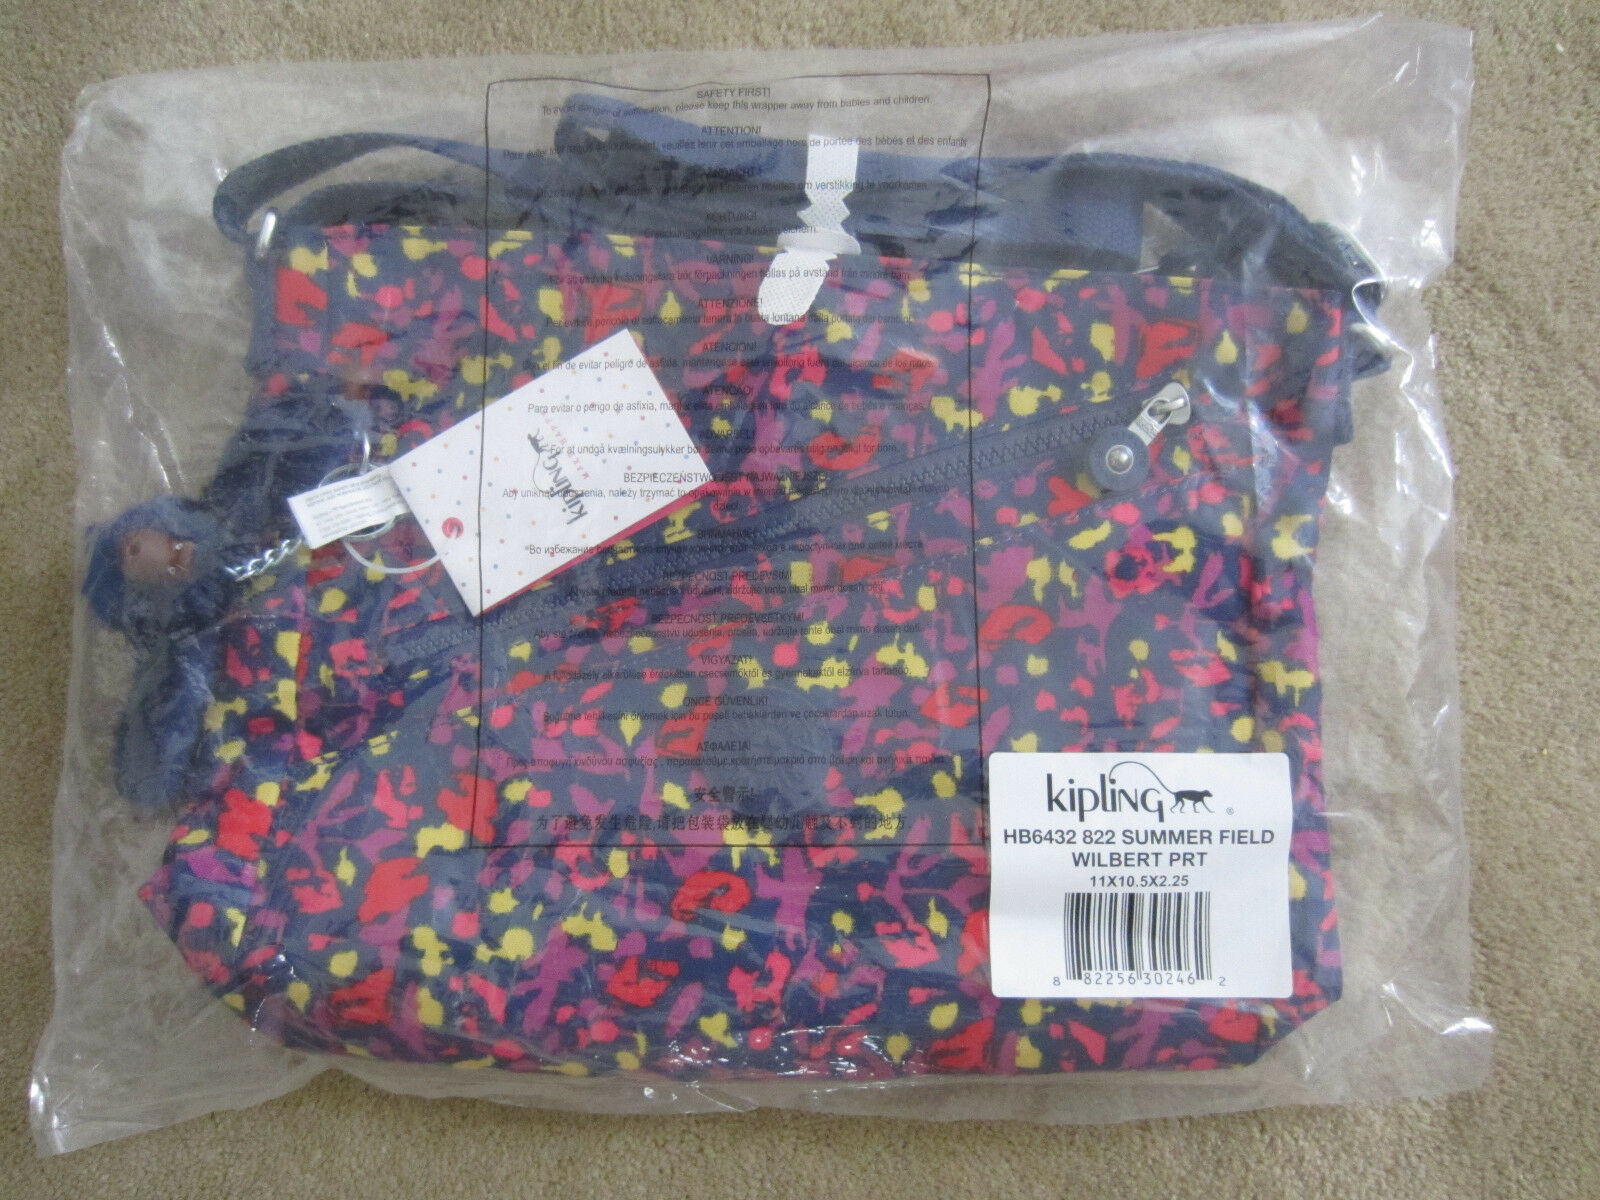 0666392821b Buy Kipling Hb6432 822 Wilbert Crossbody Shoulder Bag Summer Field ...